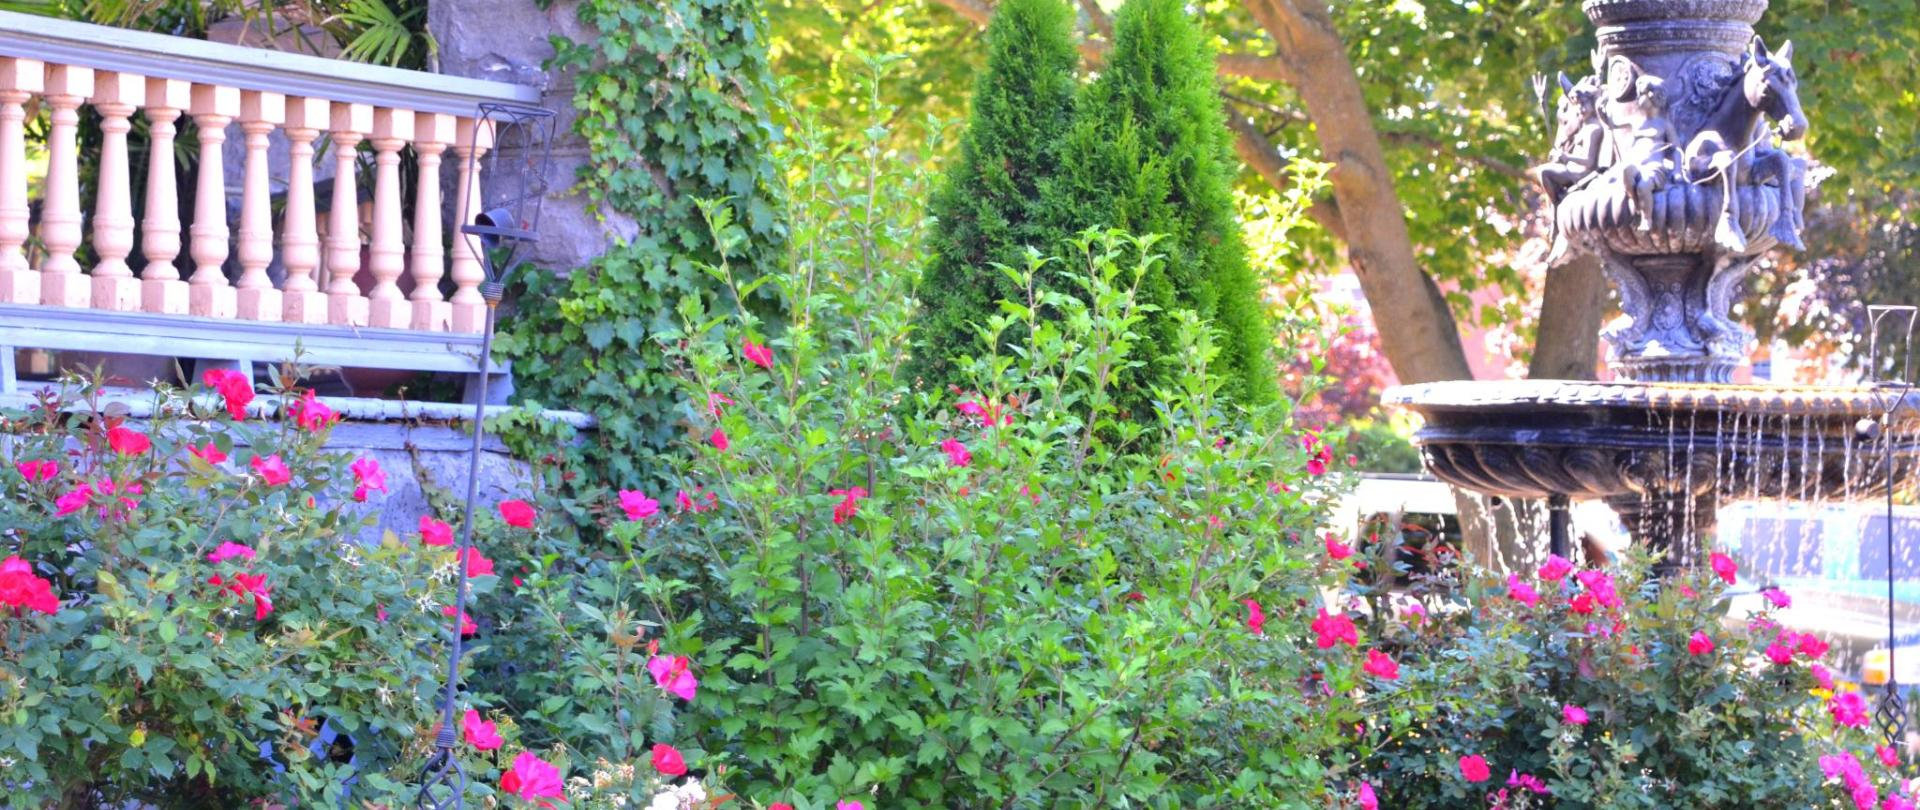 12 gardens43.jpg